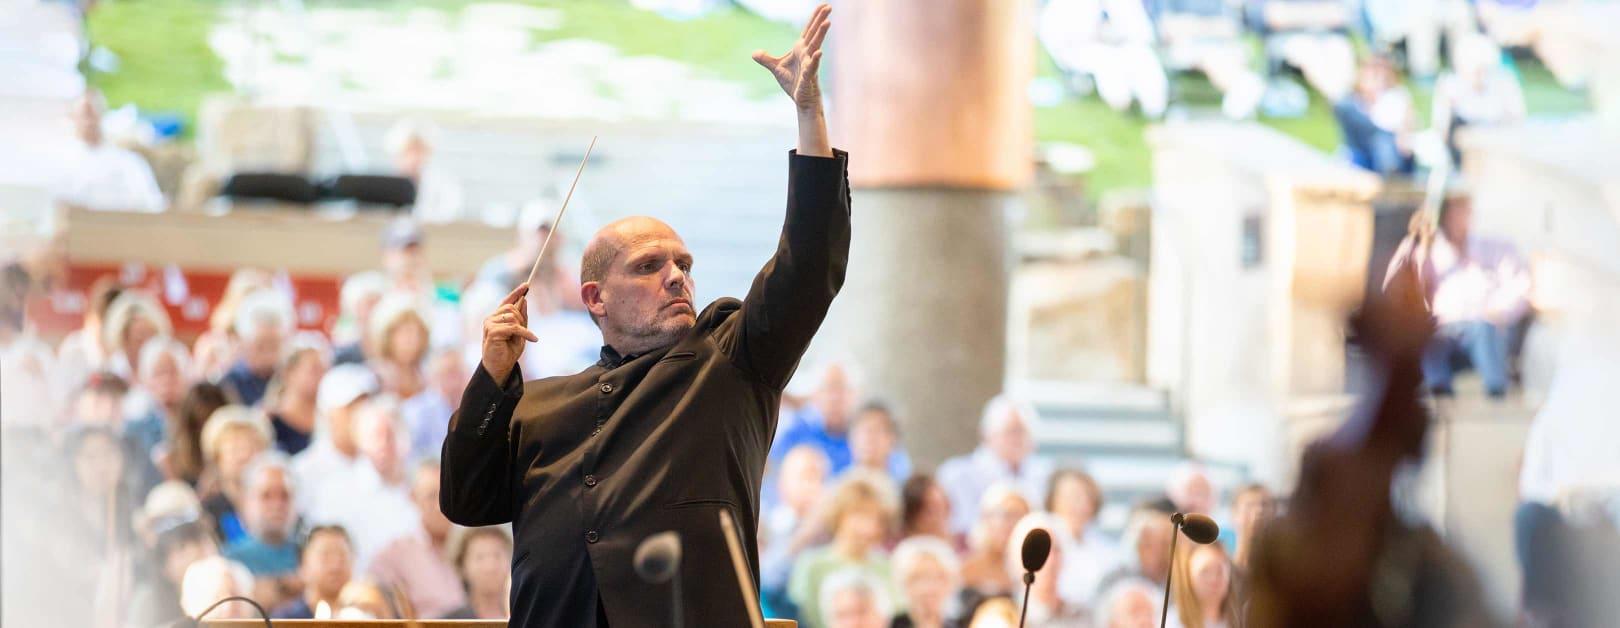 CANCELLED: Bravo! Vail: Jaap van Zweden Conducts Mahler's Symphony No. 1